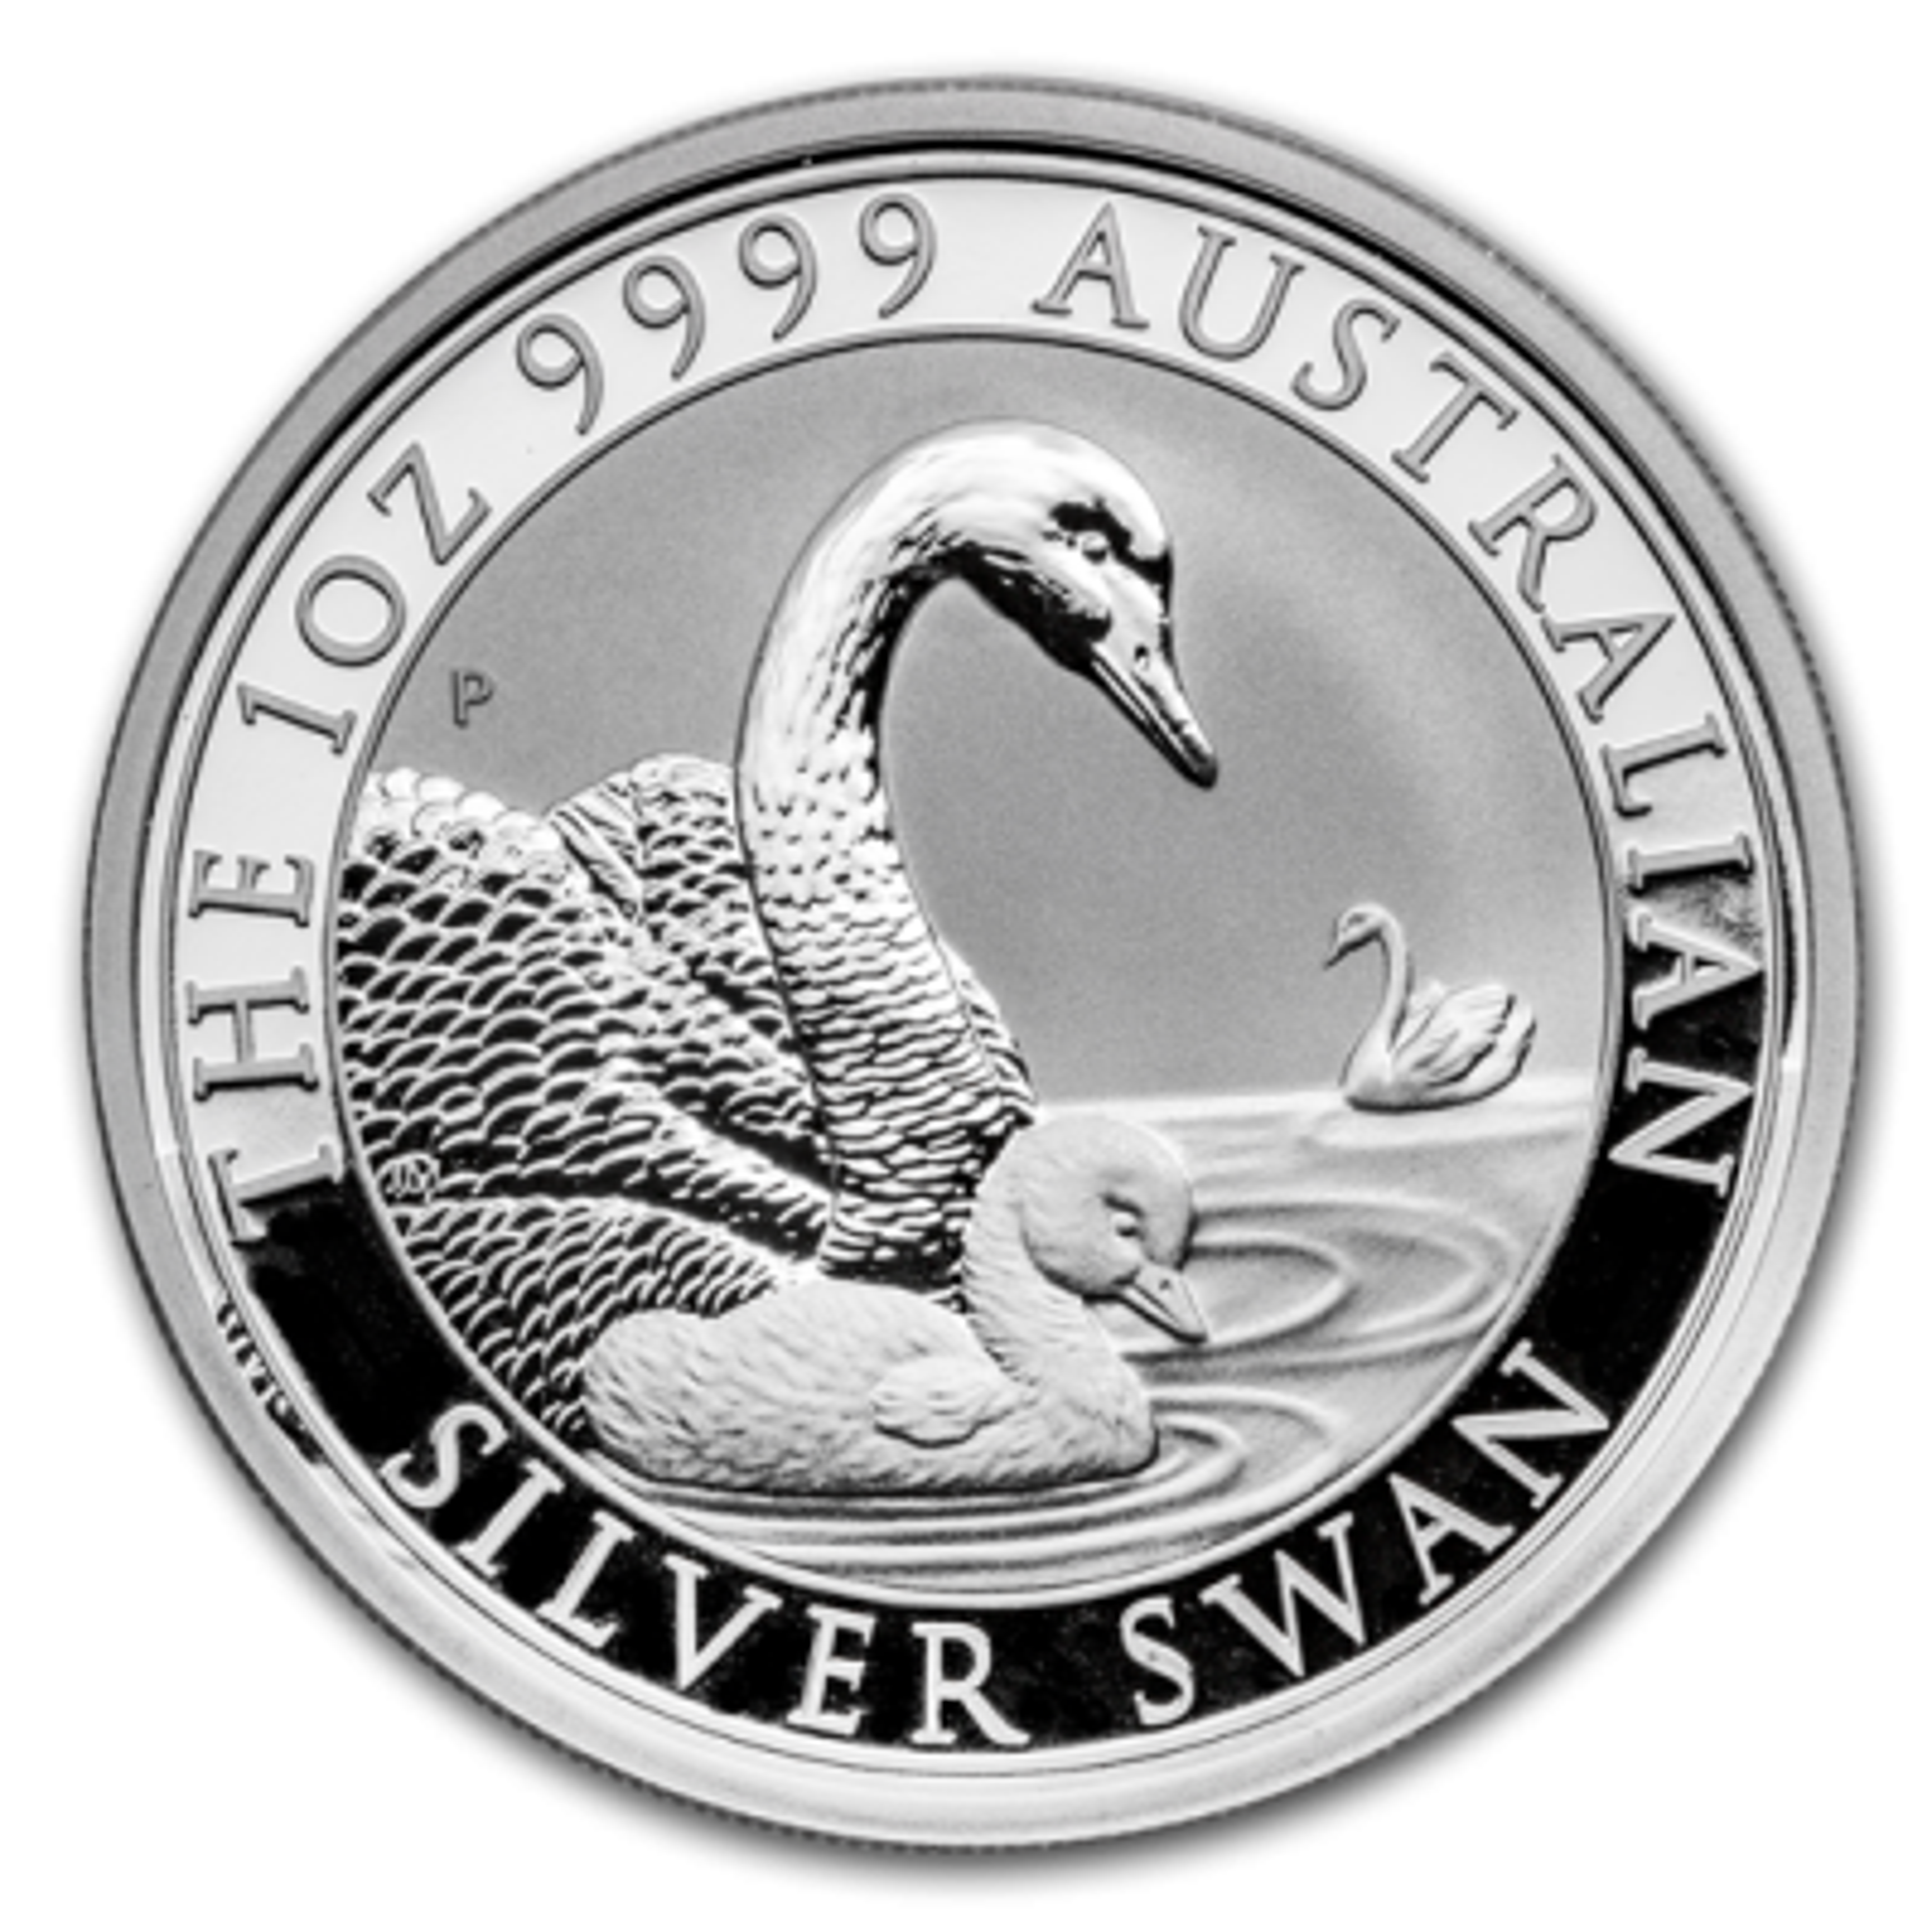 1 Troy ounce silver coin Silver Swan 2019